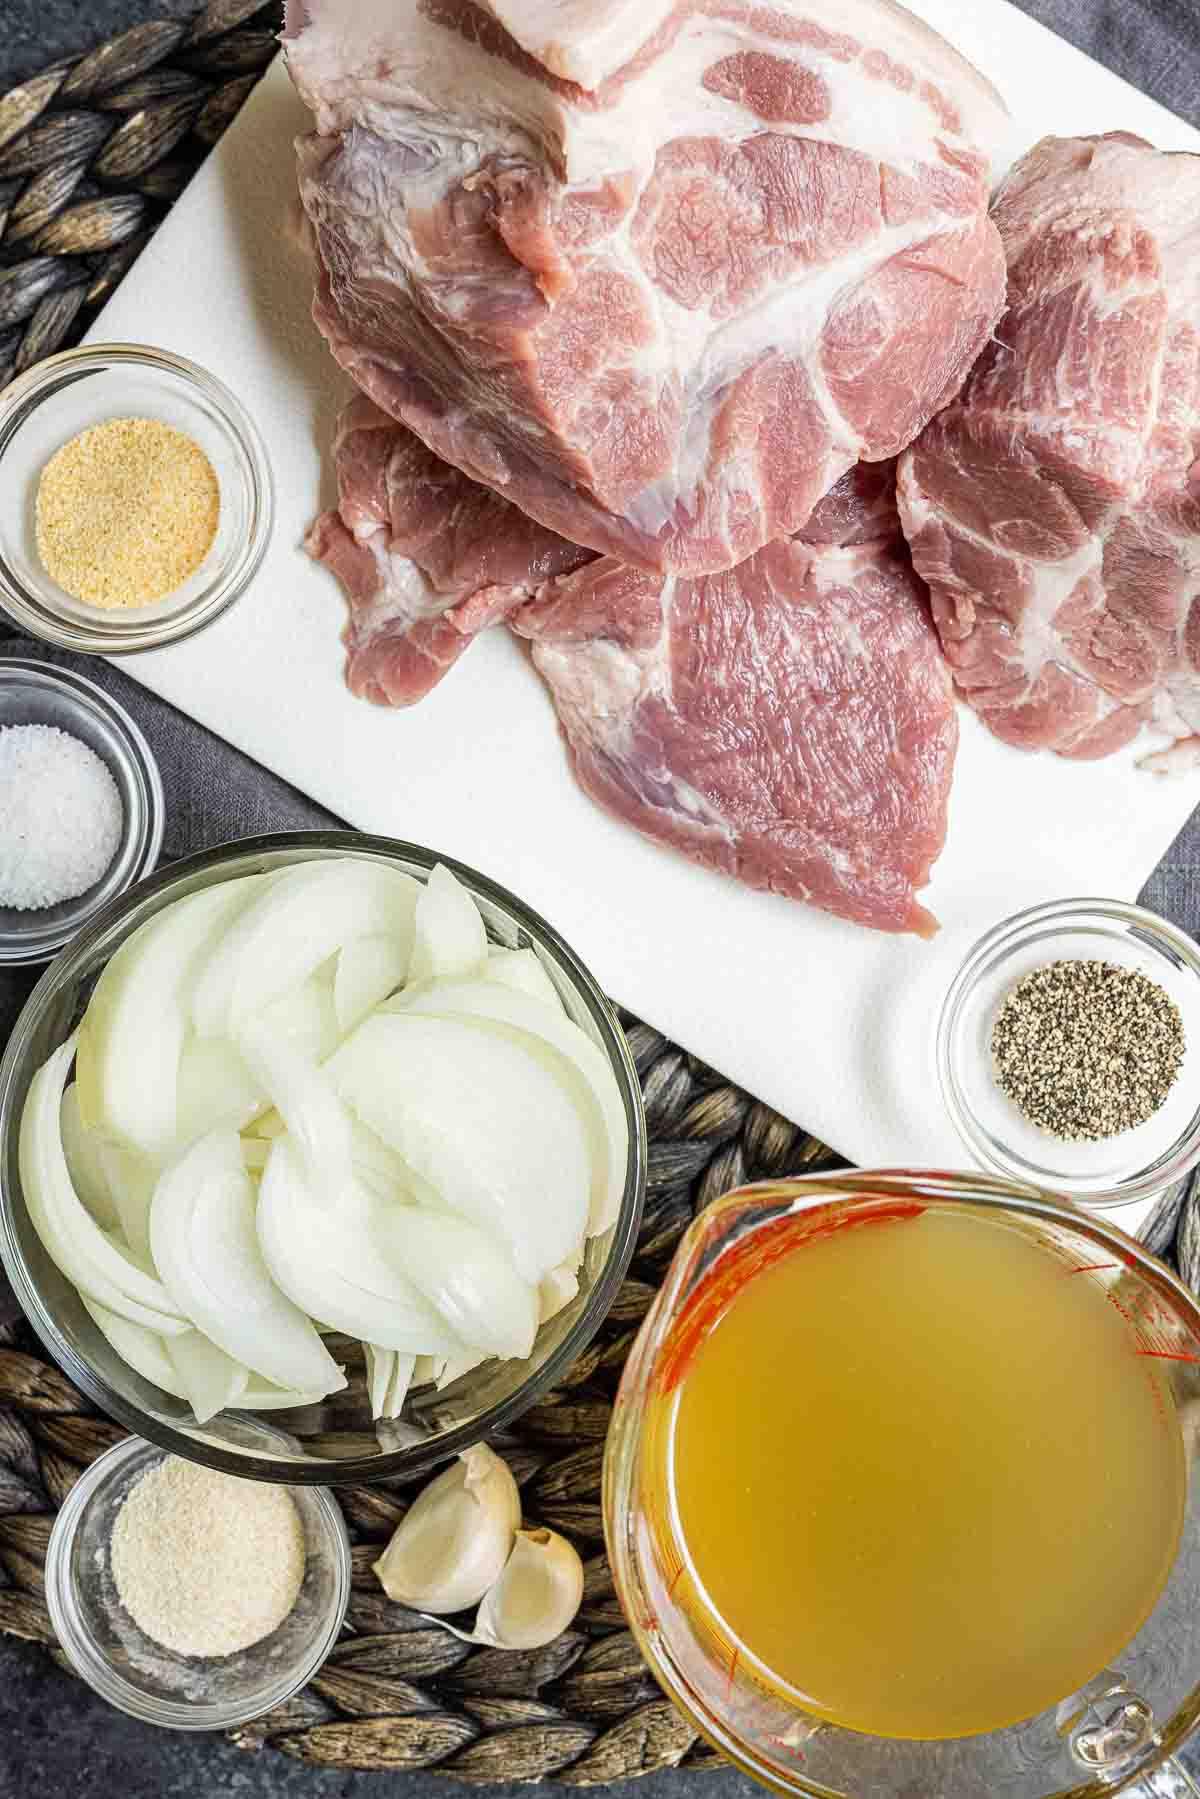 ingredients to make Instant Pot Pork Roast